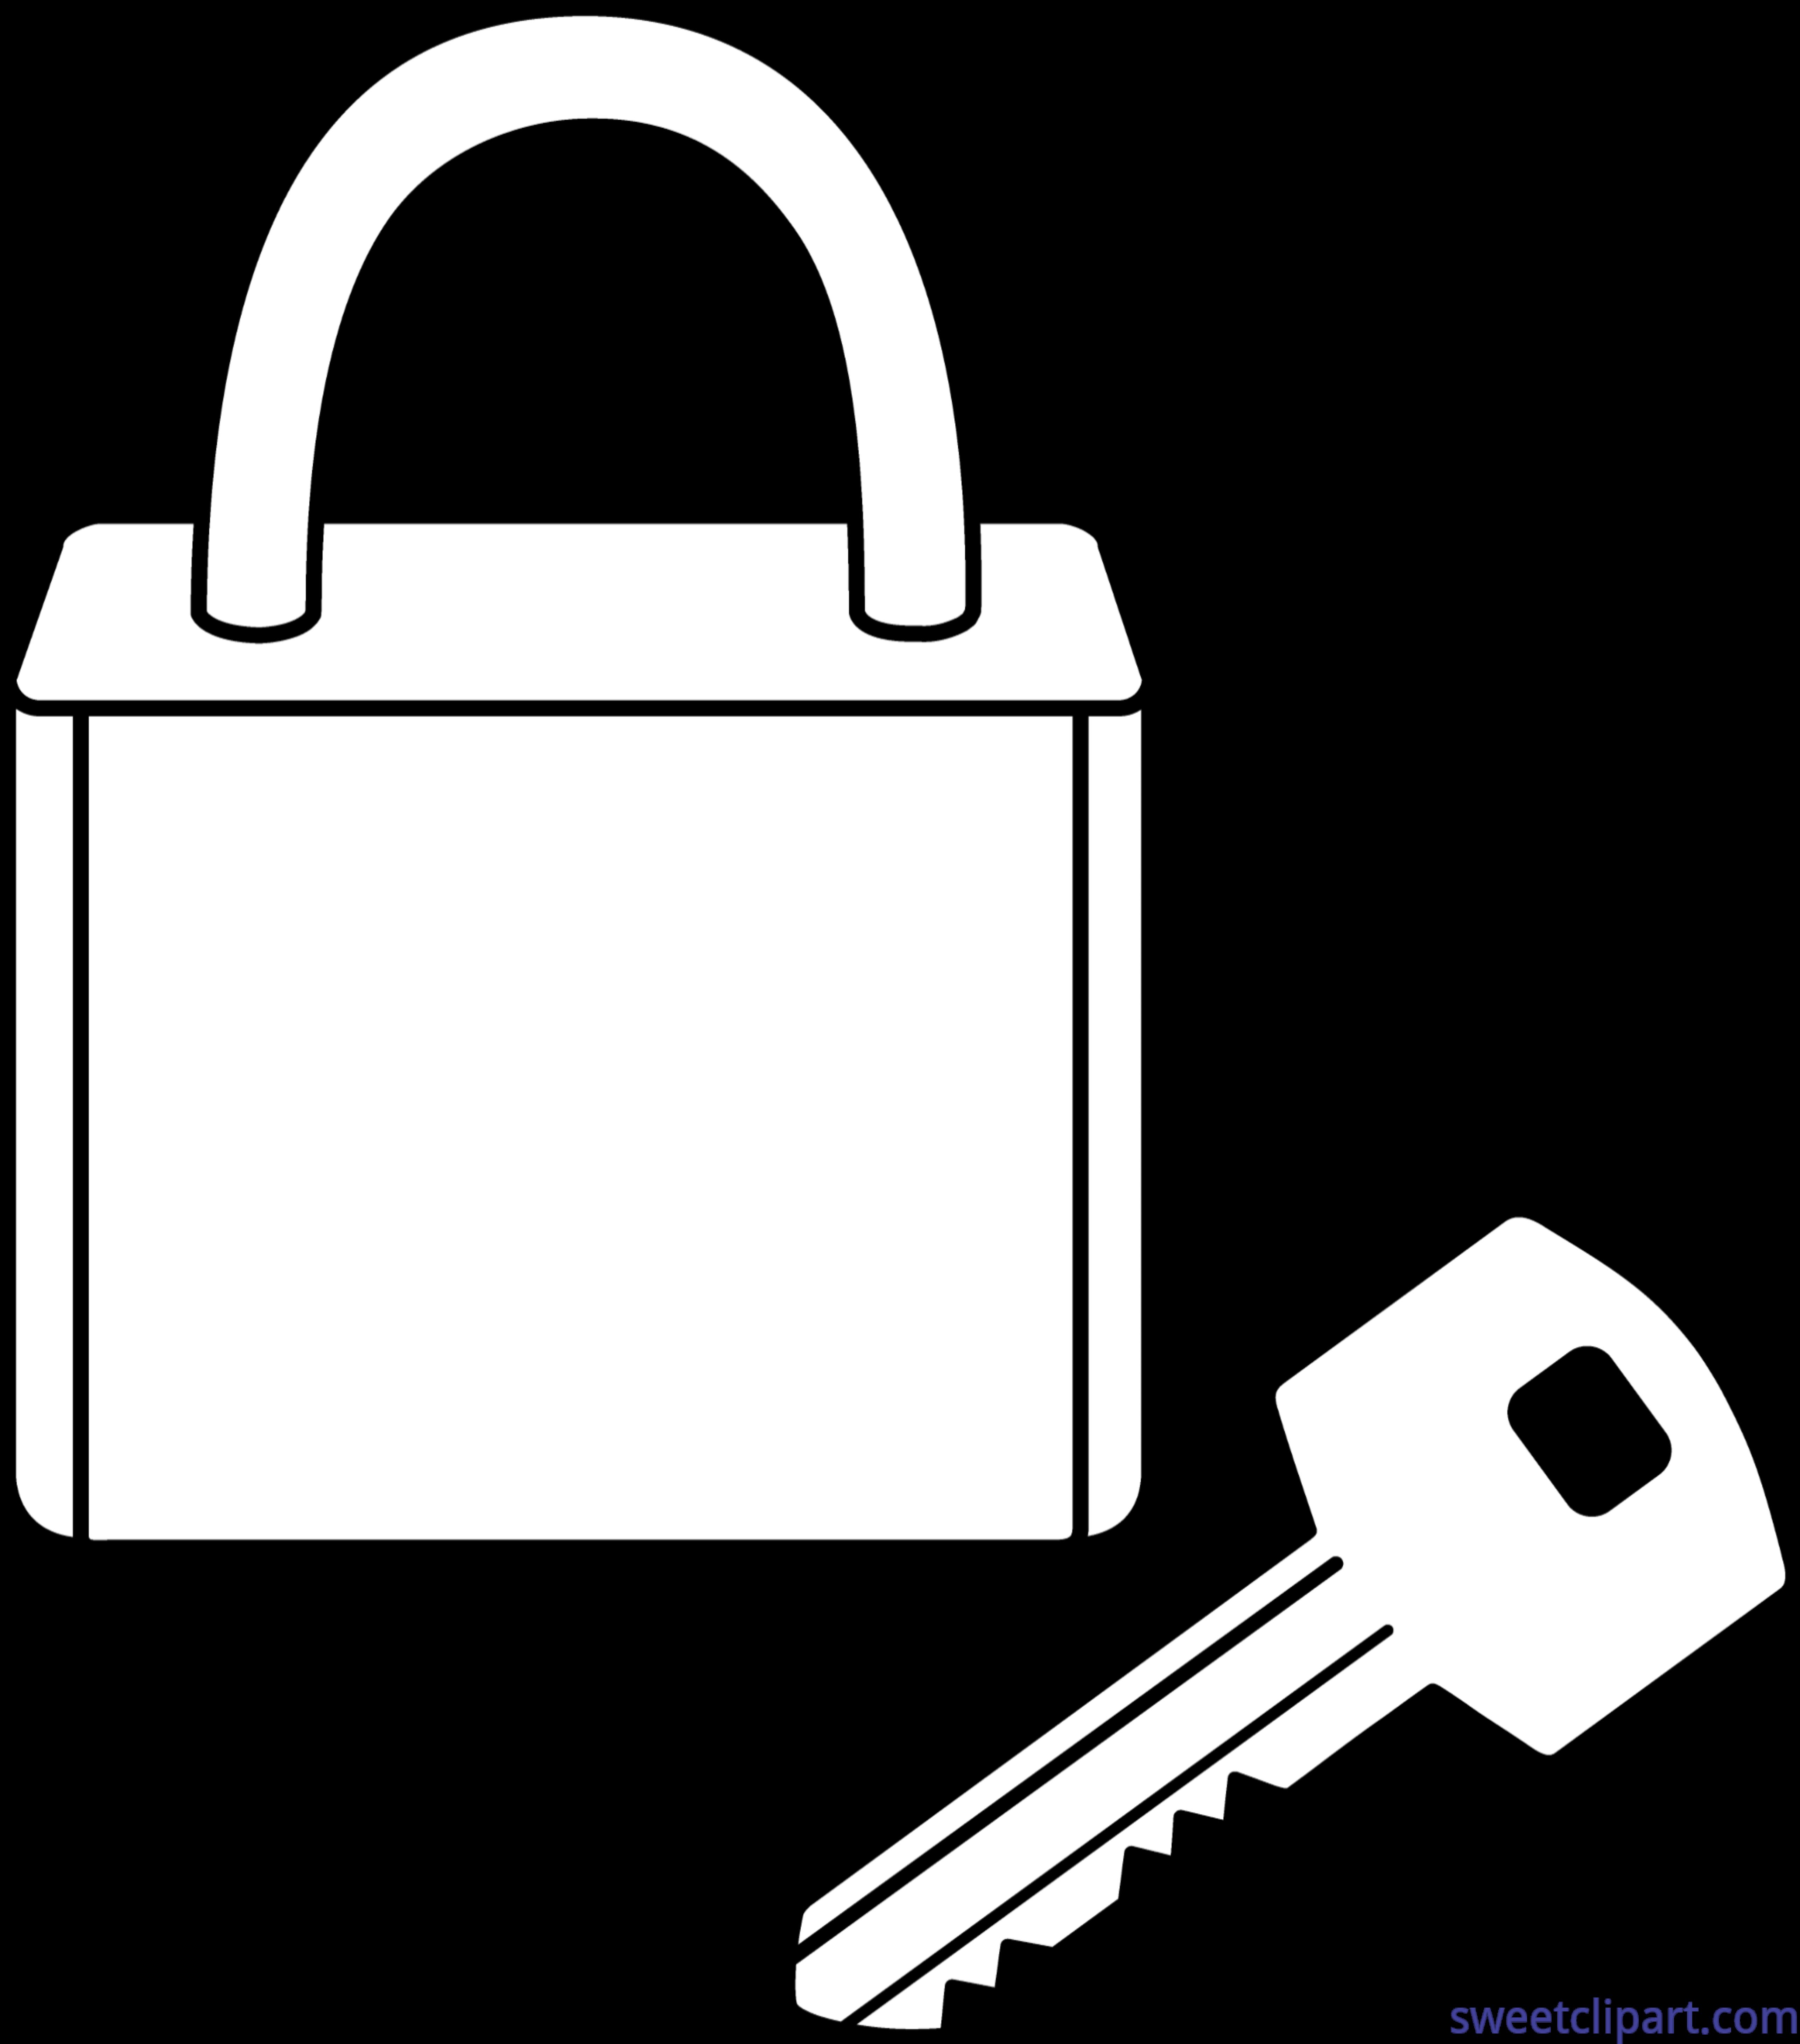 Lock clipart lock and key. Line art frames illustrations